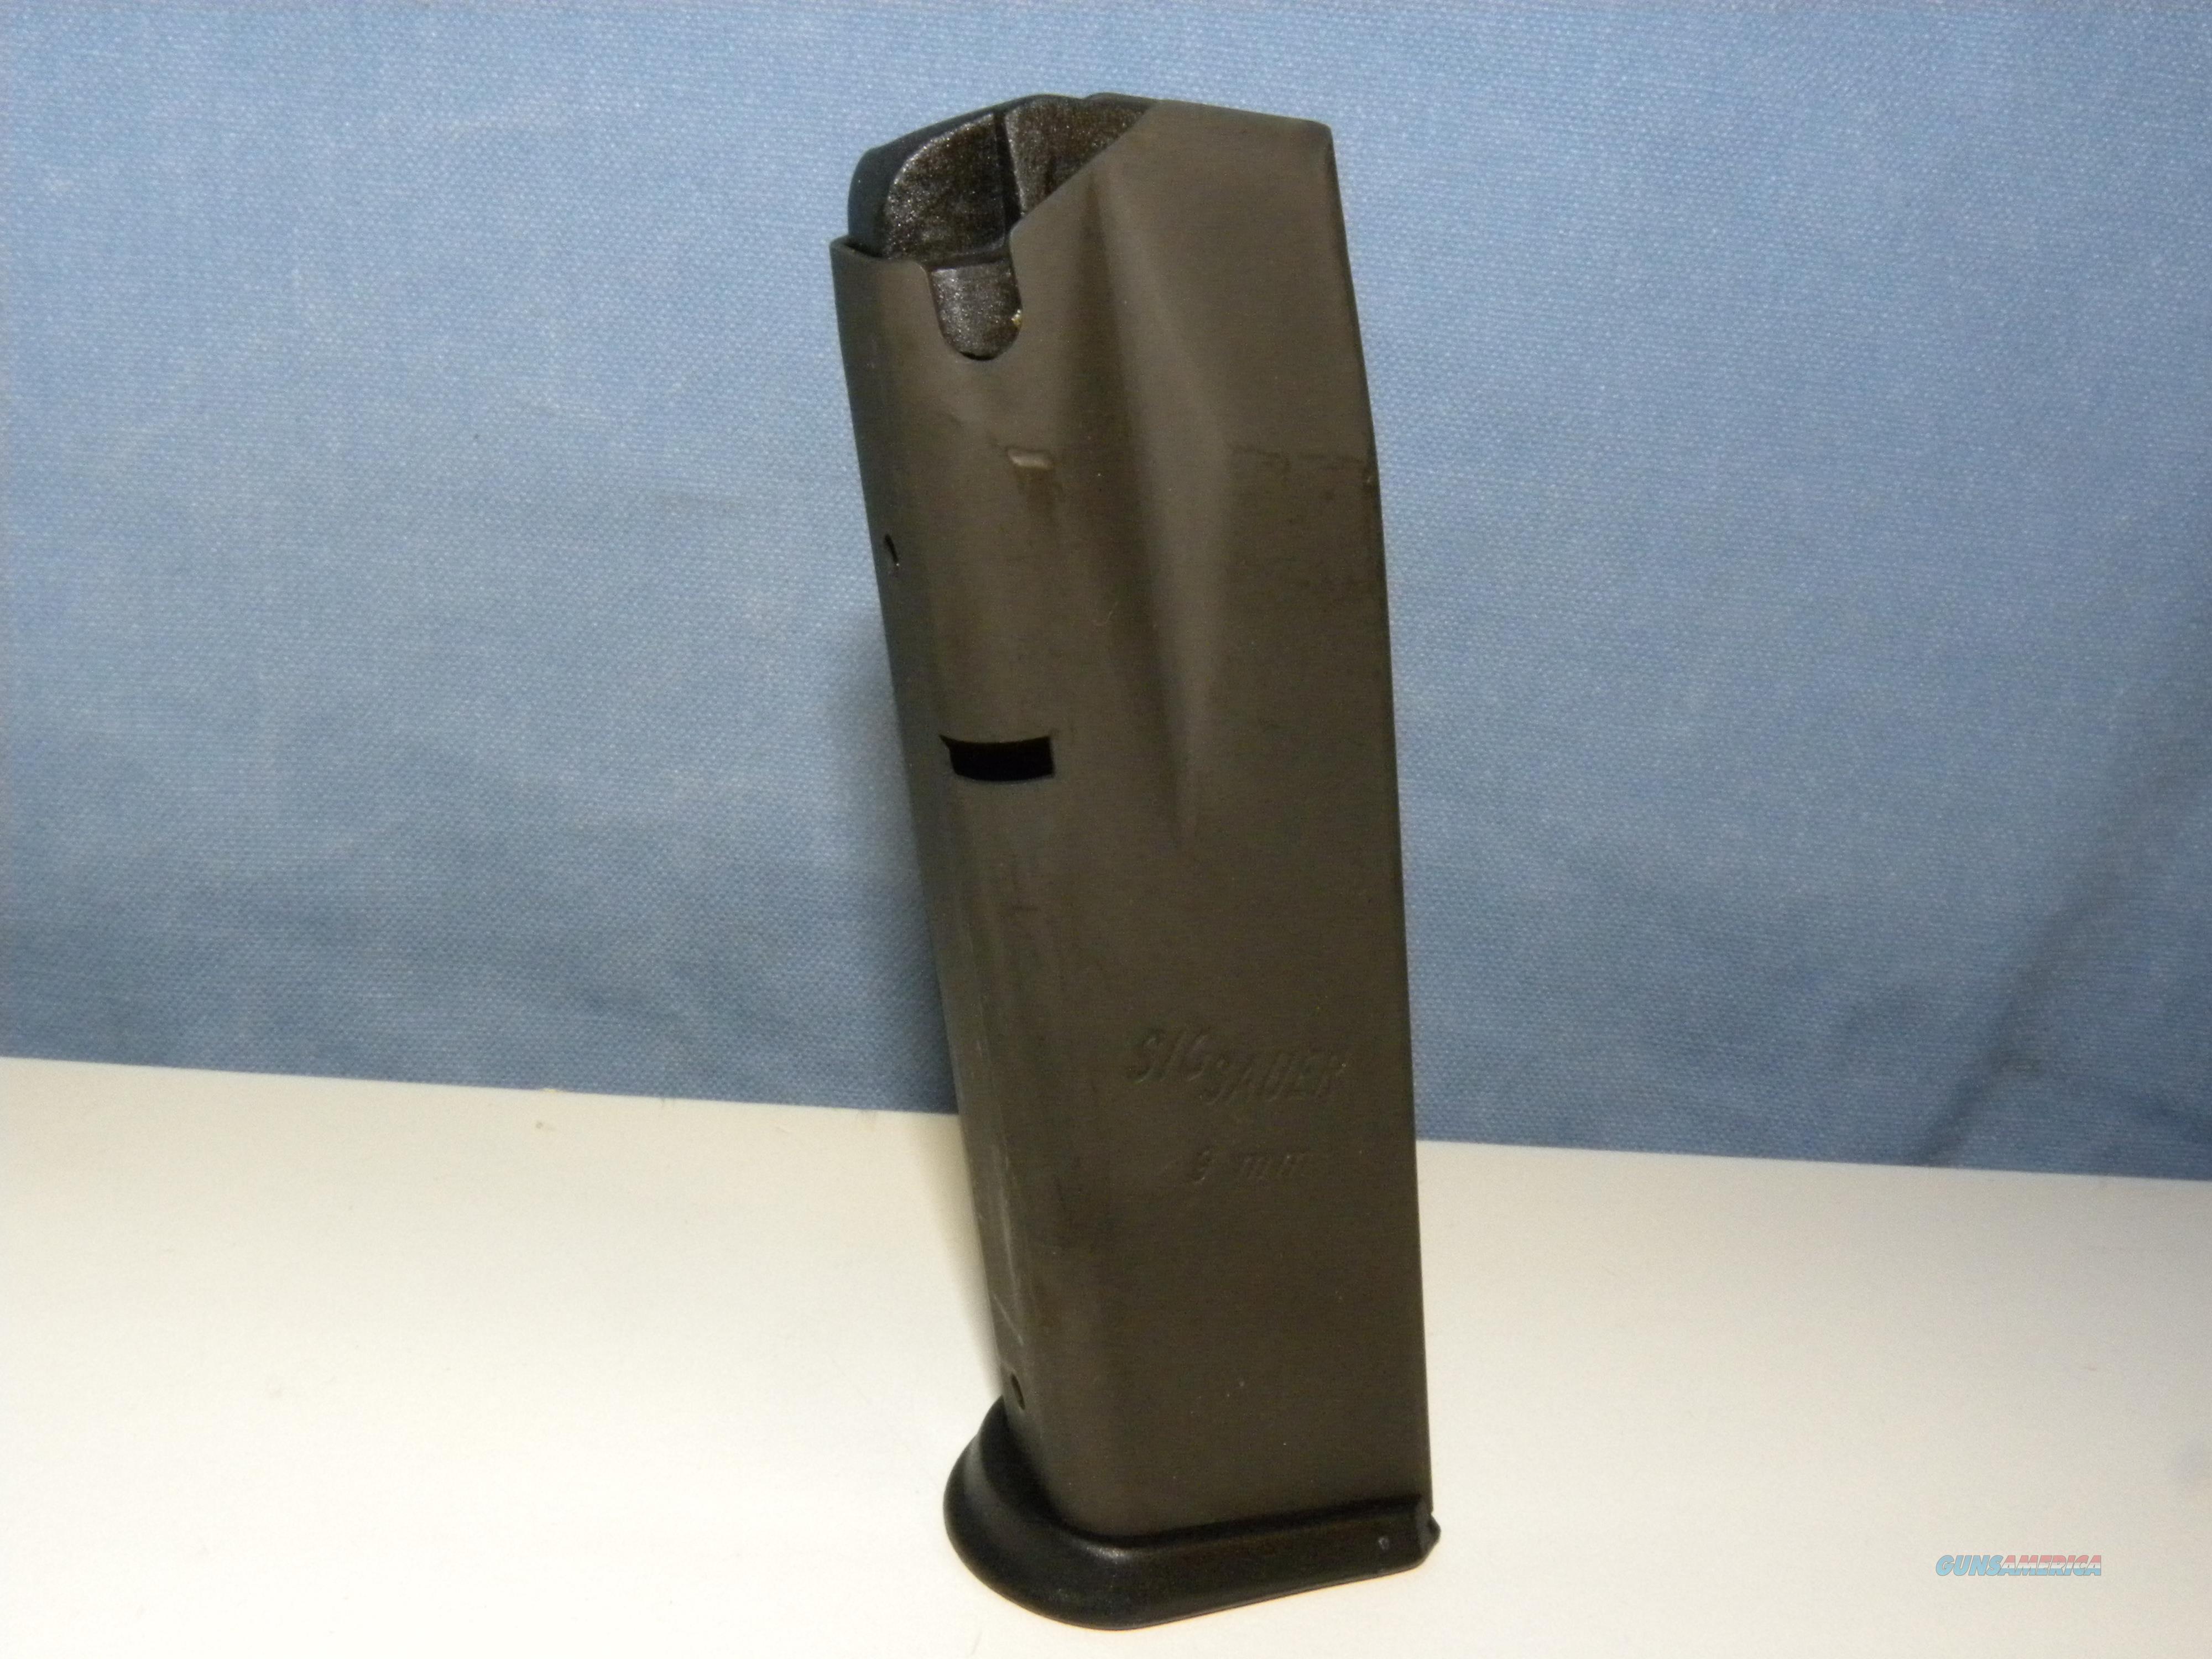 Sig Sauer 228/229 9mm Magazine 13 Round Used  Non-Guns > Magazines & Clips > Pistol Magazines > Sig